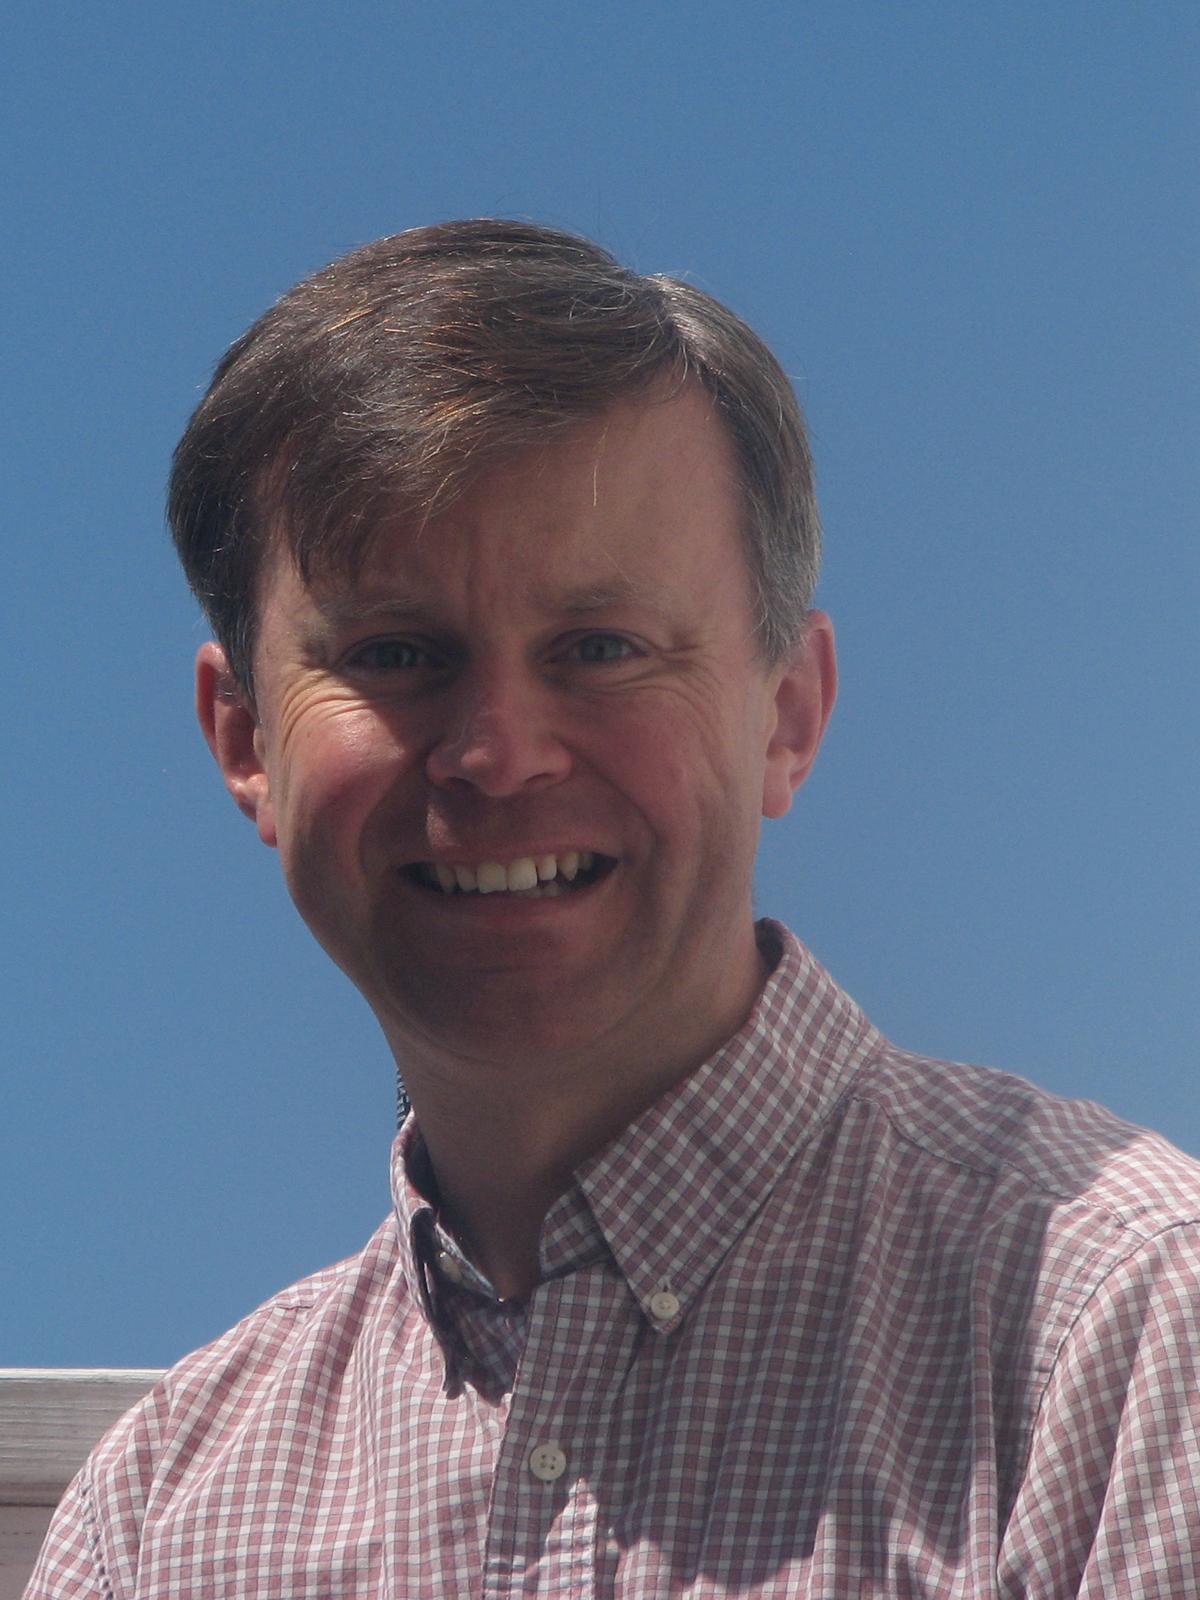 Robert Chalkley